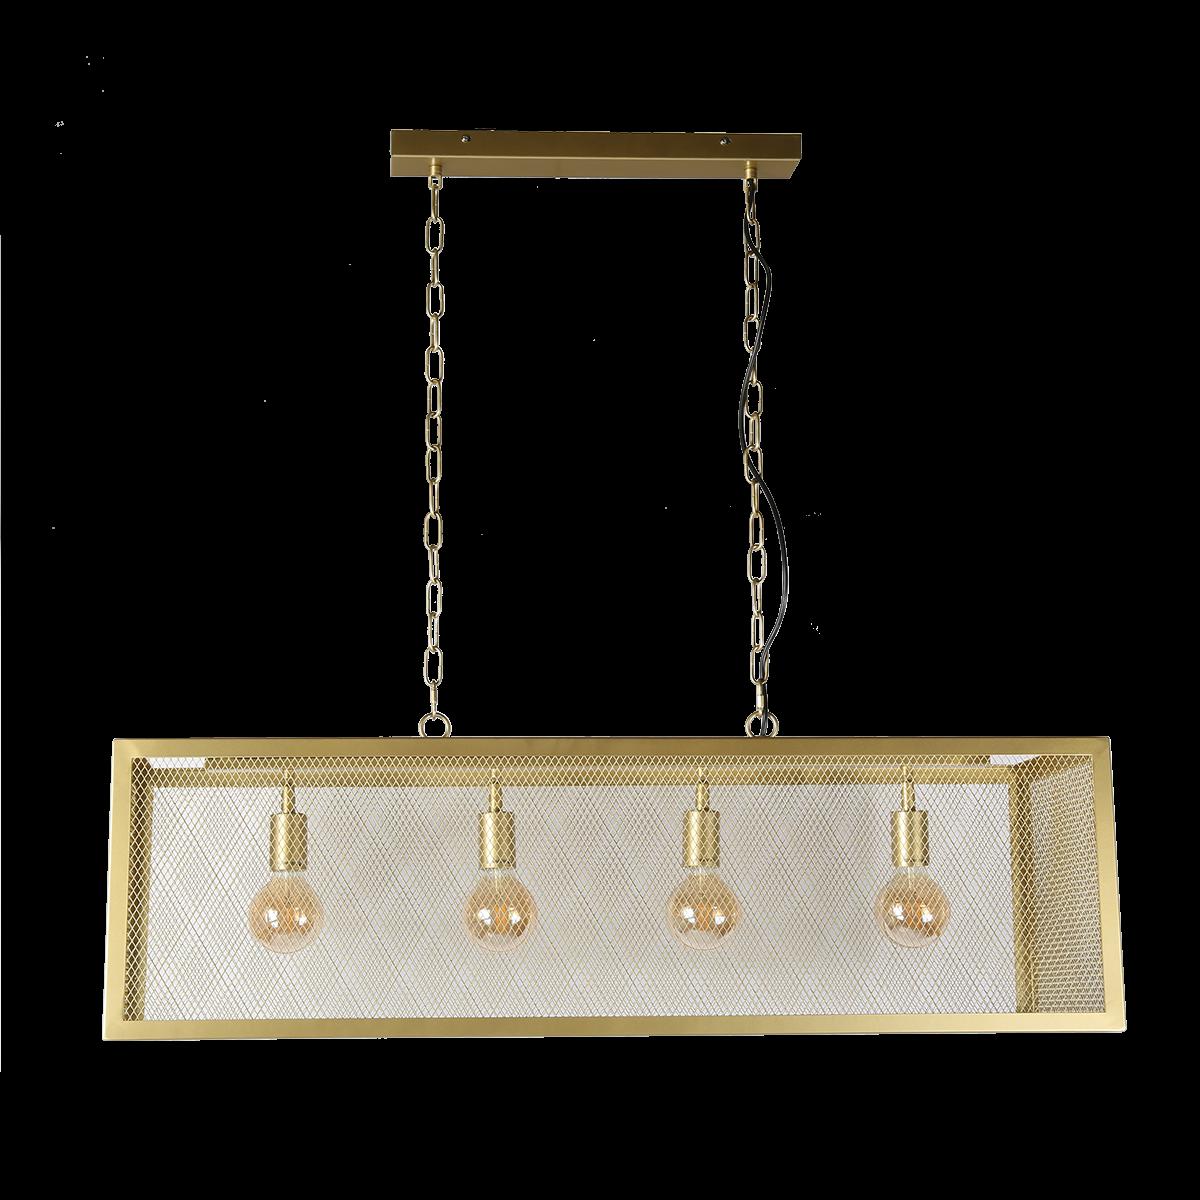 Hanglamp Sweden 4 lichts goud